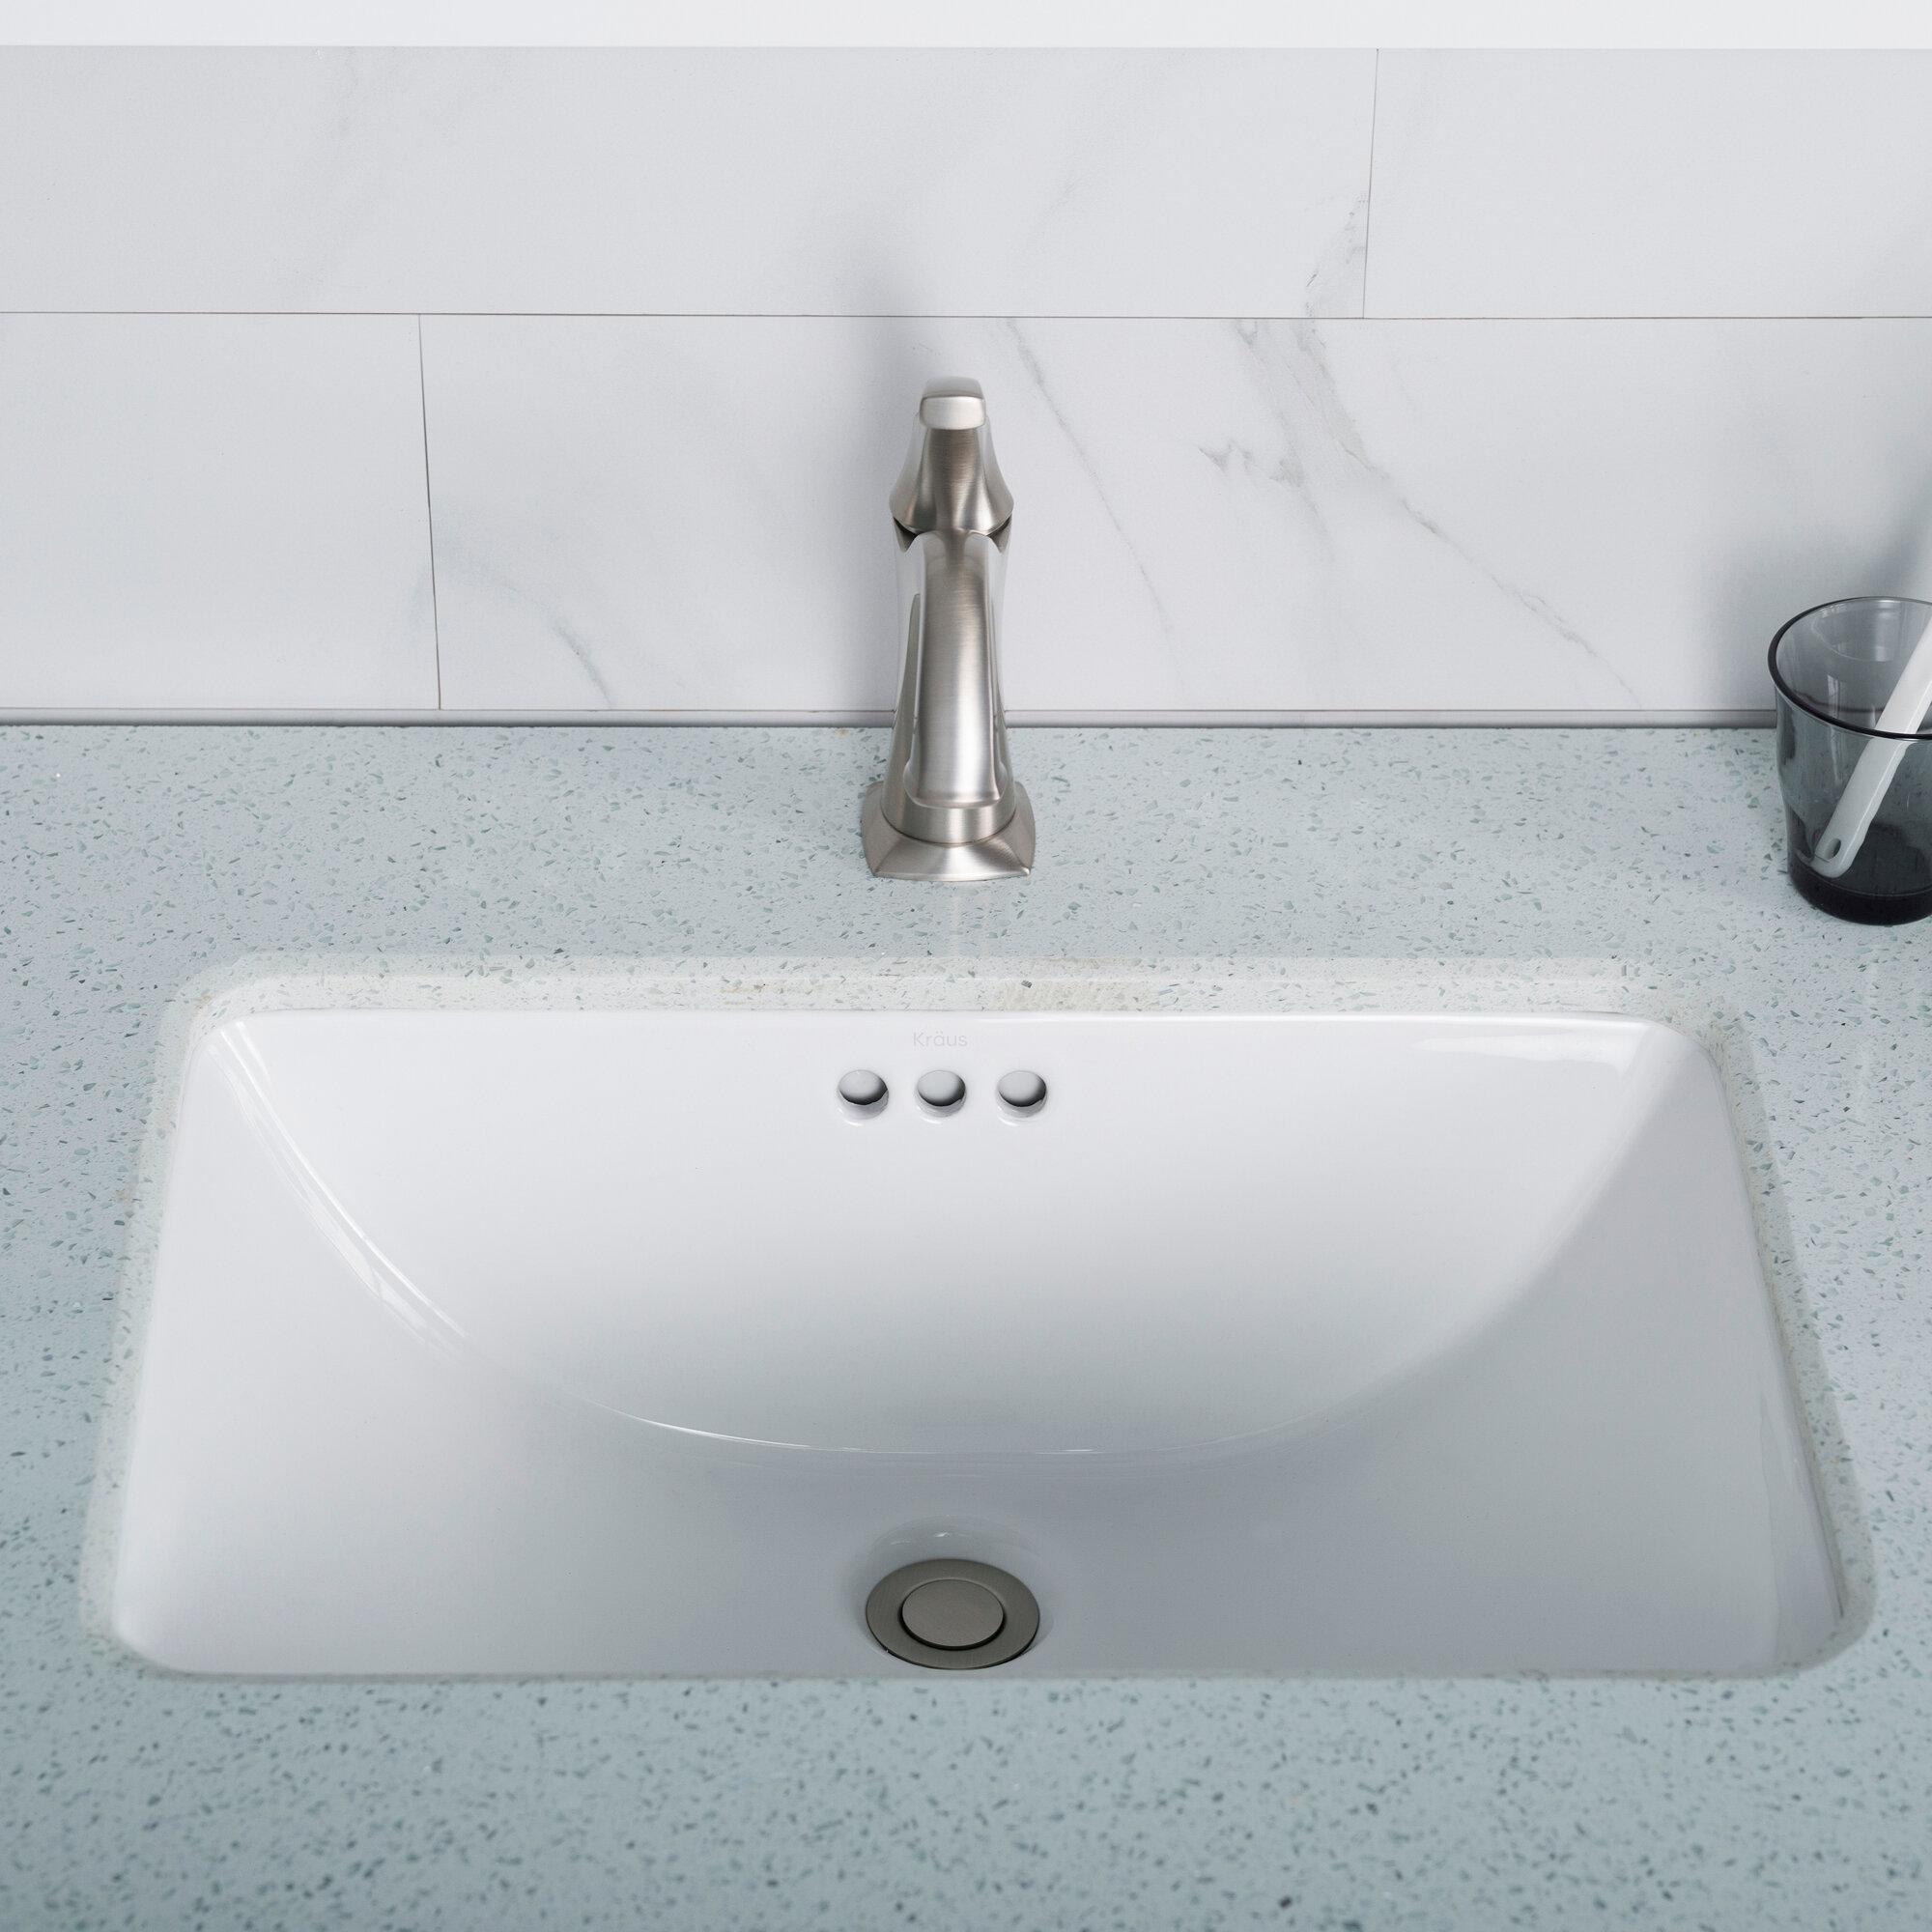 Kcu 241 Kraus Elavo Ceramic Rectangular Undermount Bathroom Sink